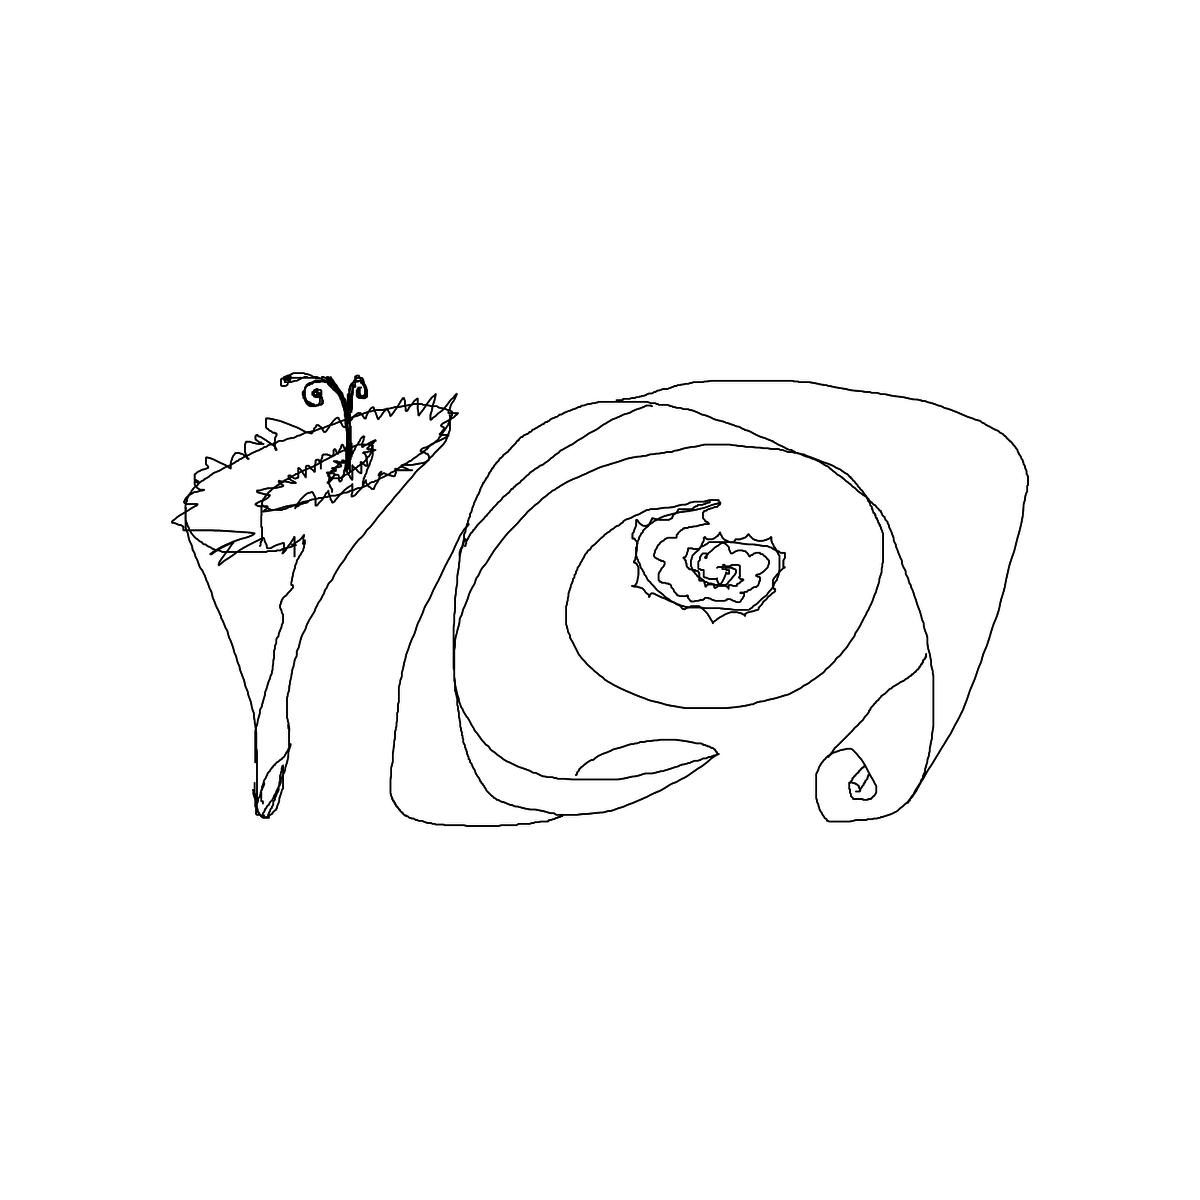 BAAAM drawing#770 lat:41.3562622070312500lng: 2.1045567989349365